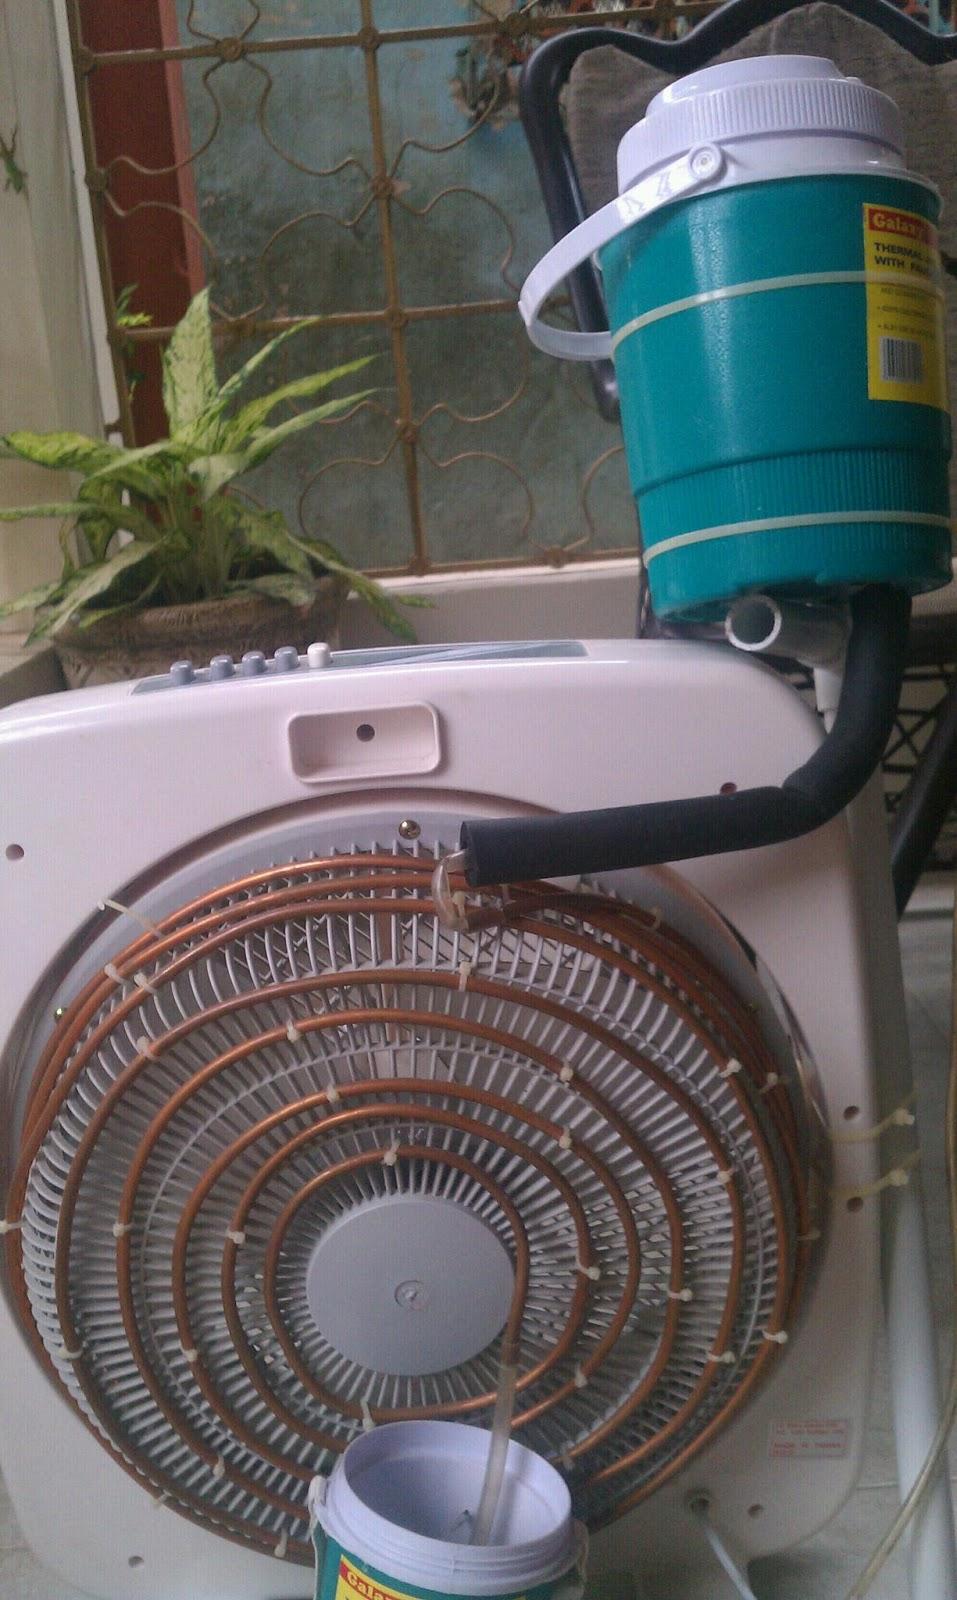 Electronica de patio como hacer un aire acondicionado for Como montar un aire acondicionado